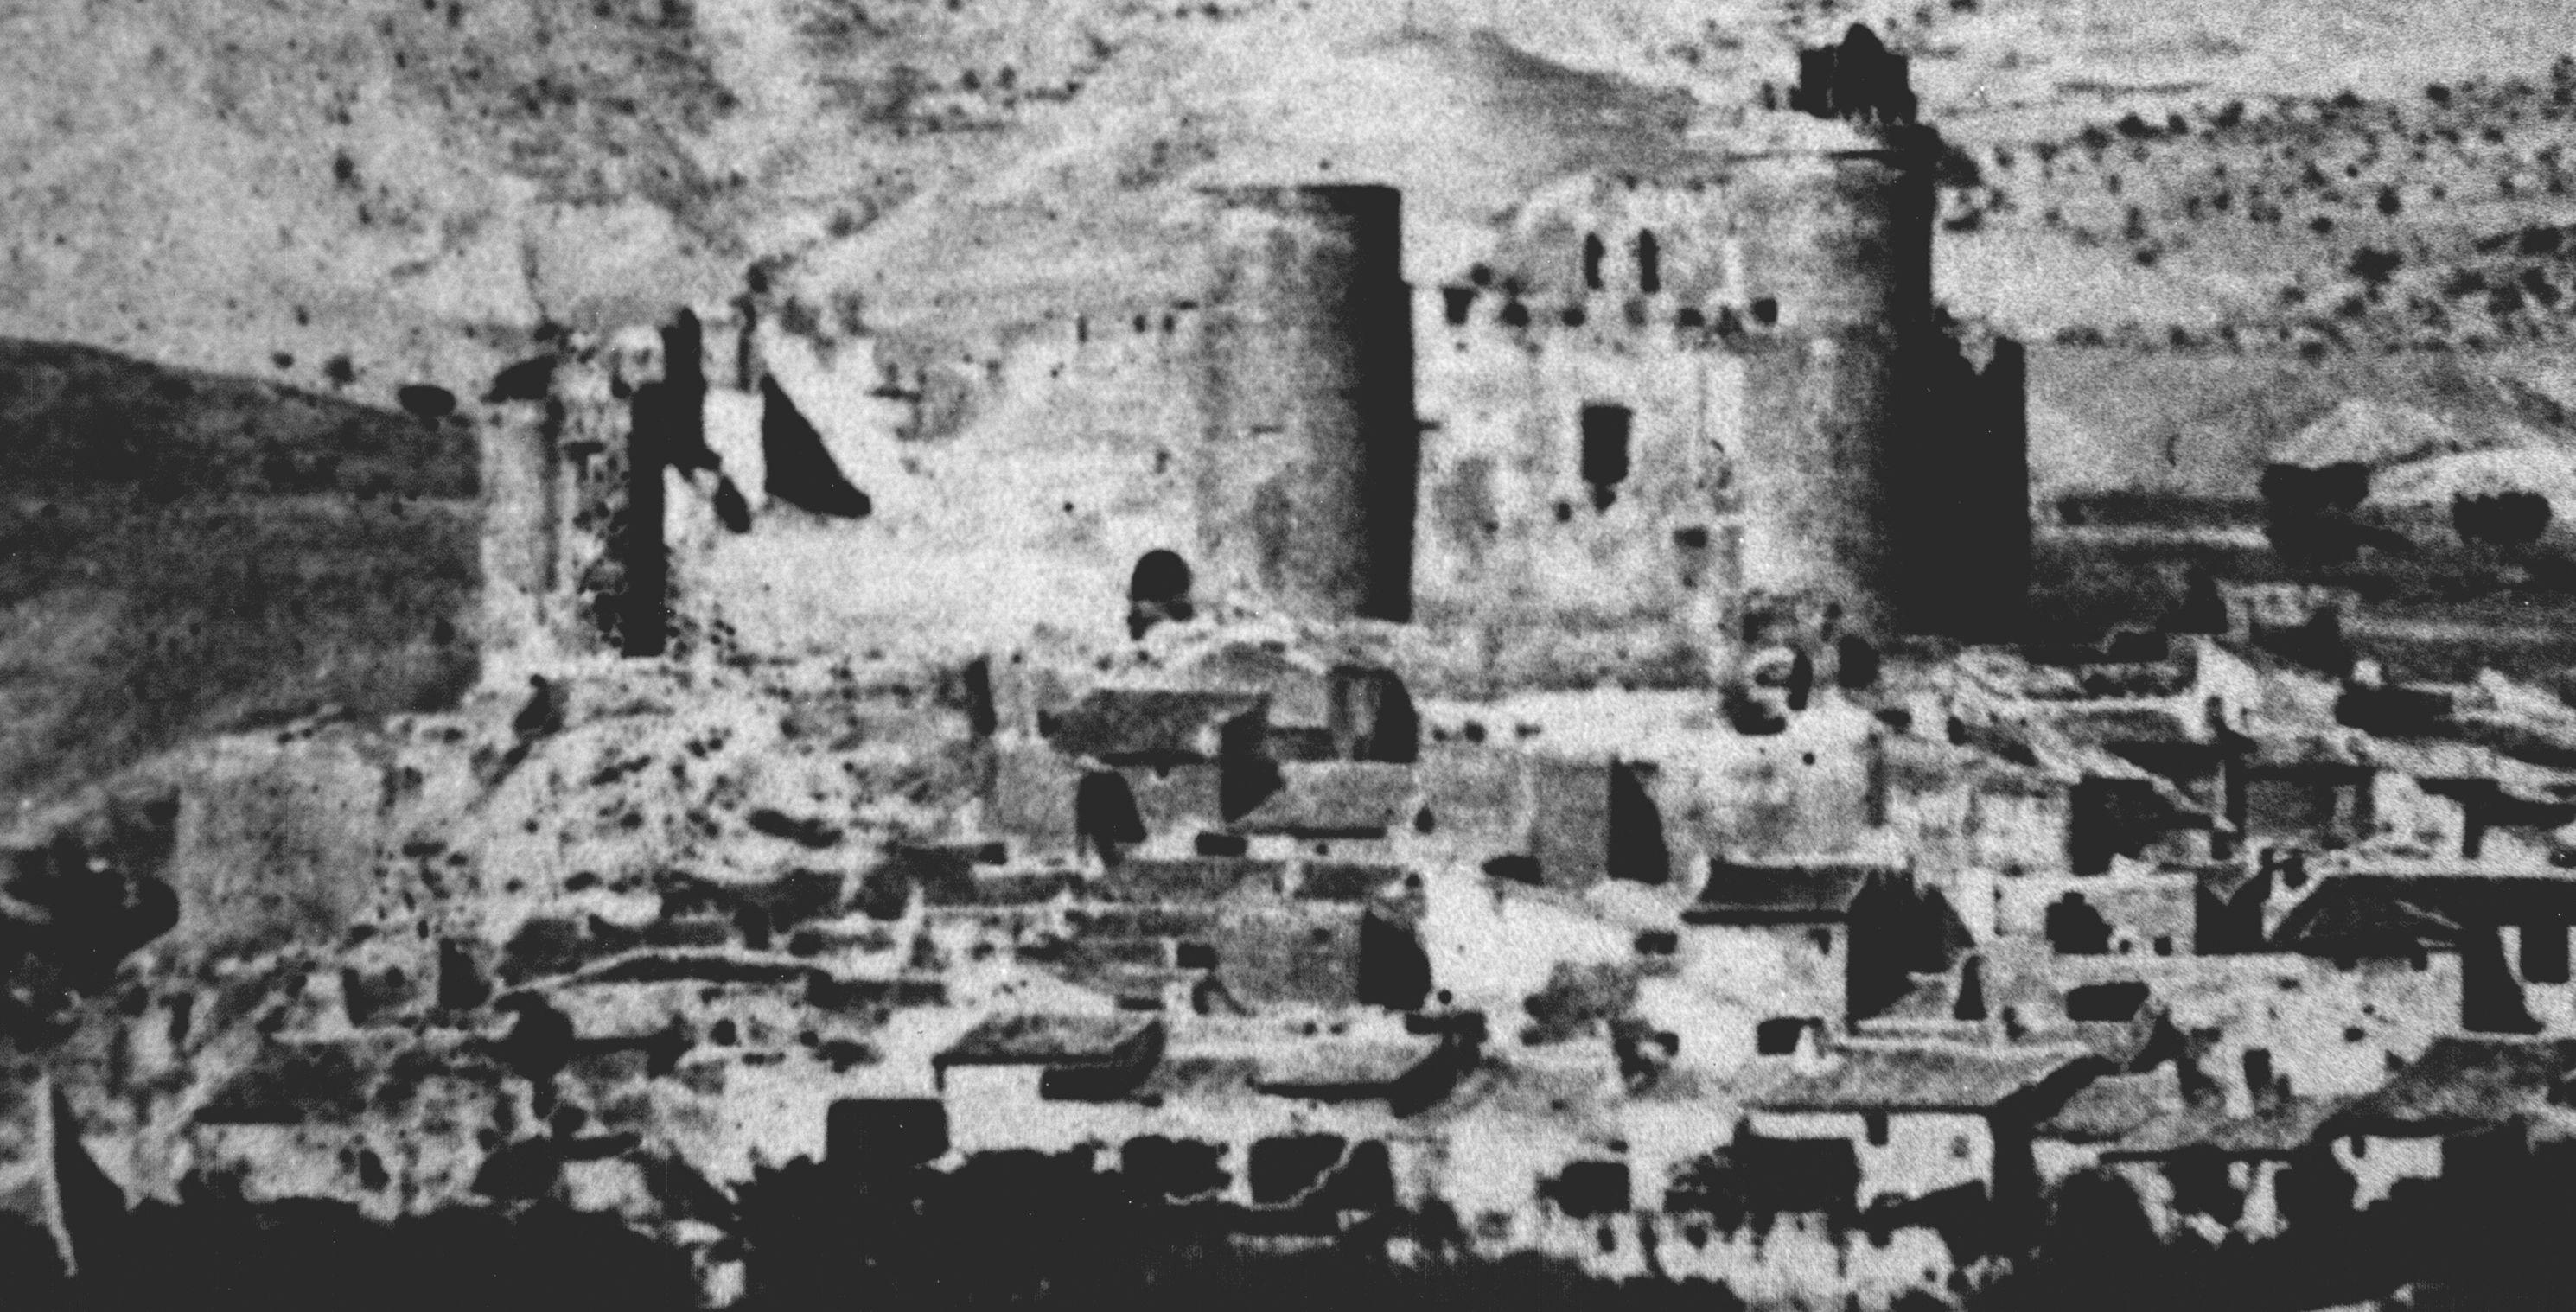 Territorio Coloma - Valle de Elda, castillo de los Coloma